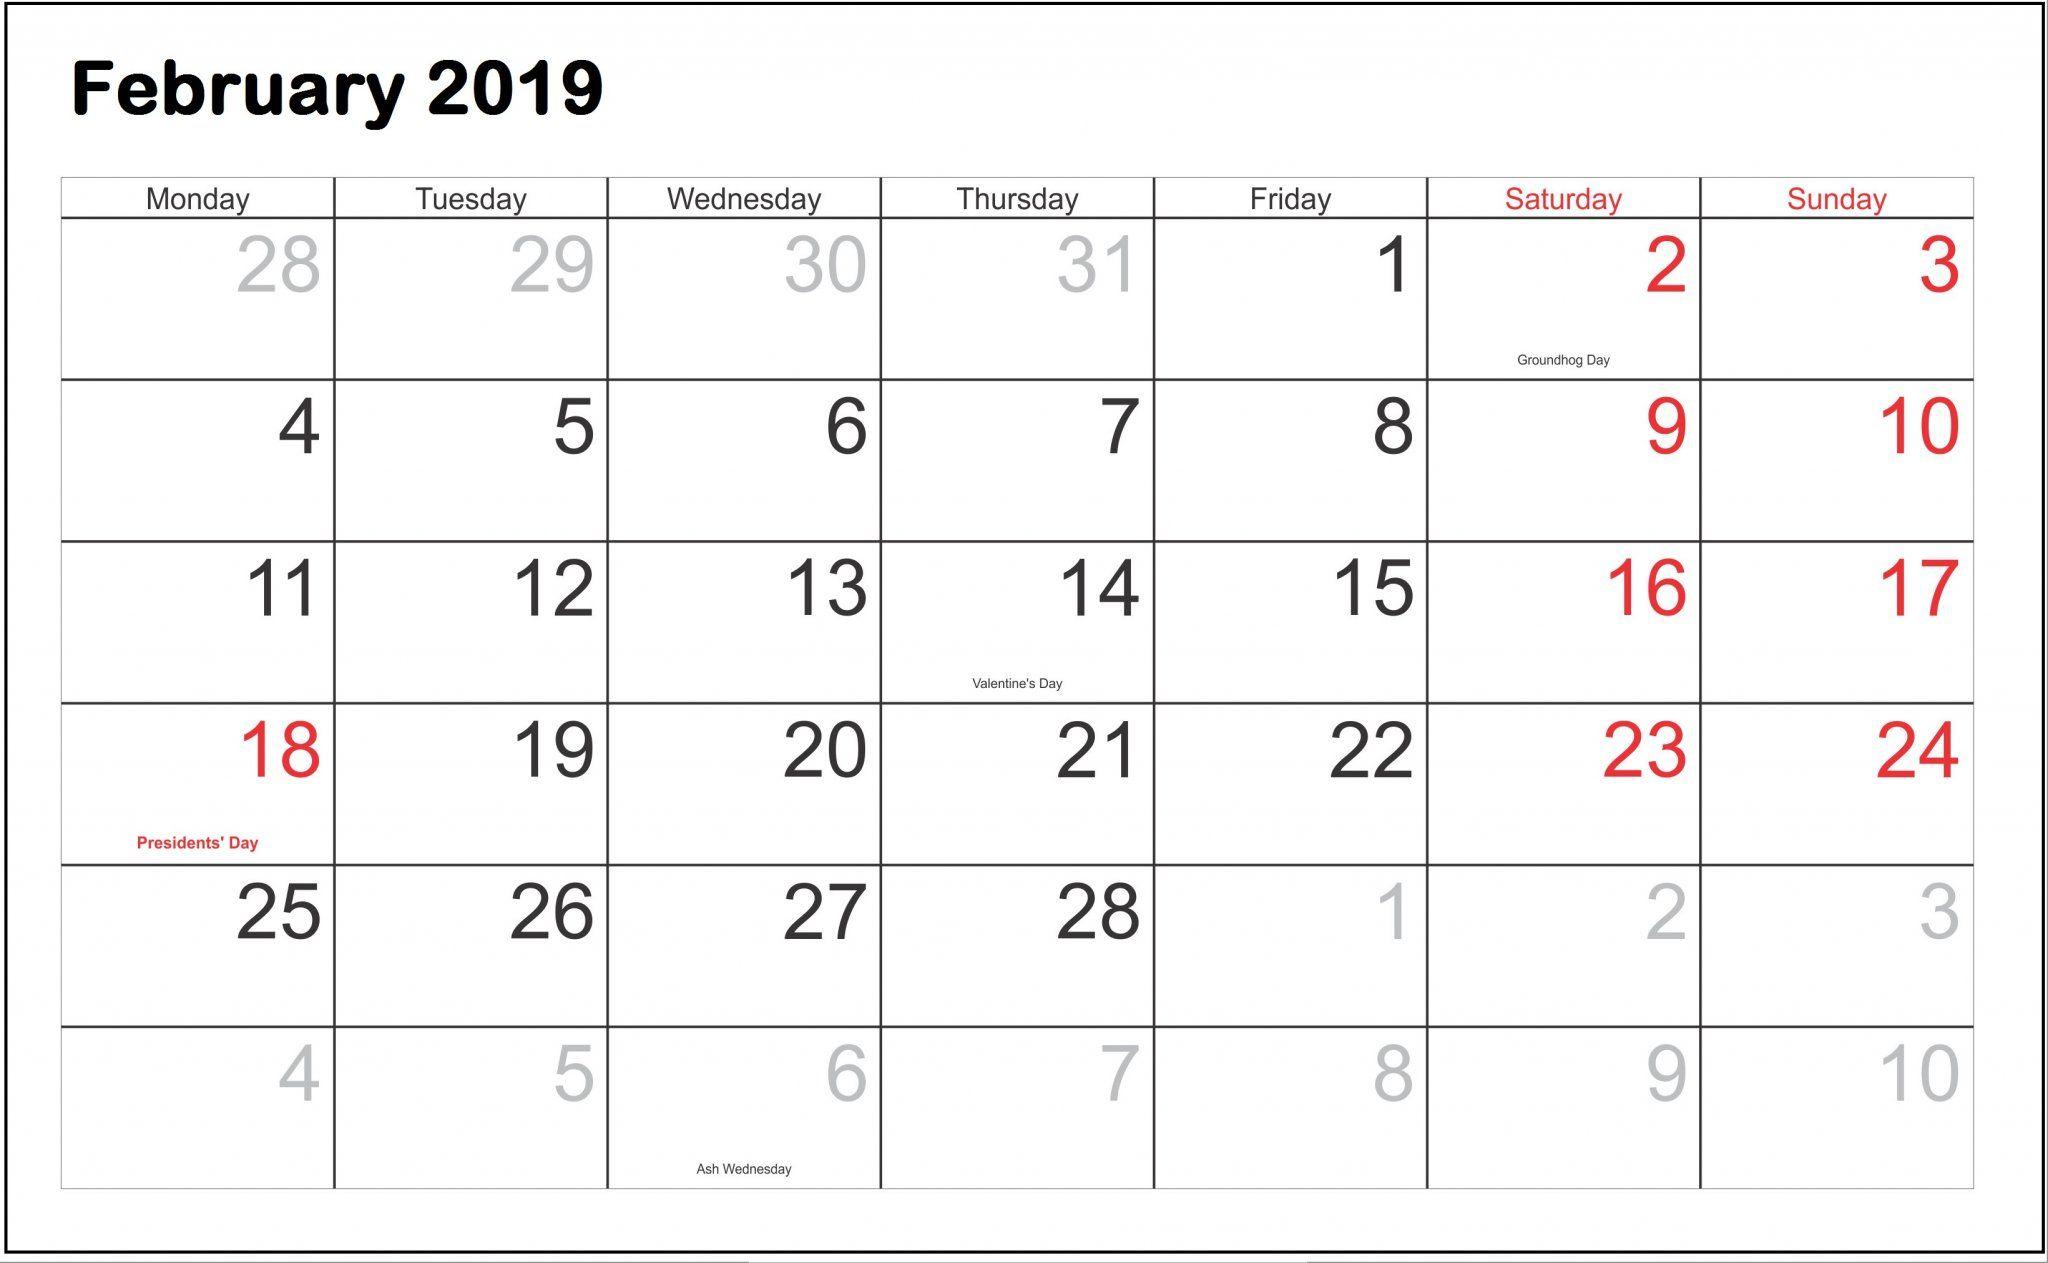 February 2019 Calendar National February 2019 Calendar With National Holidays   125+ February 2019